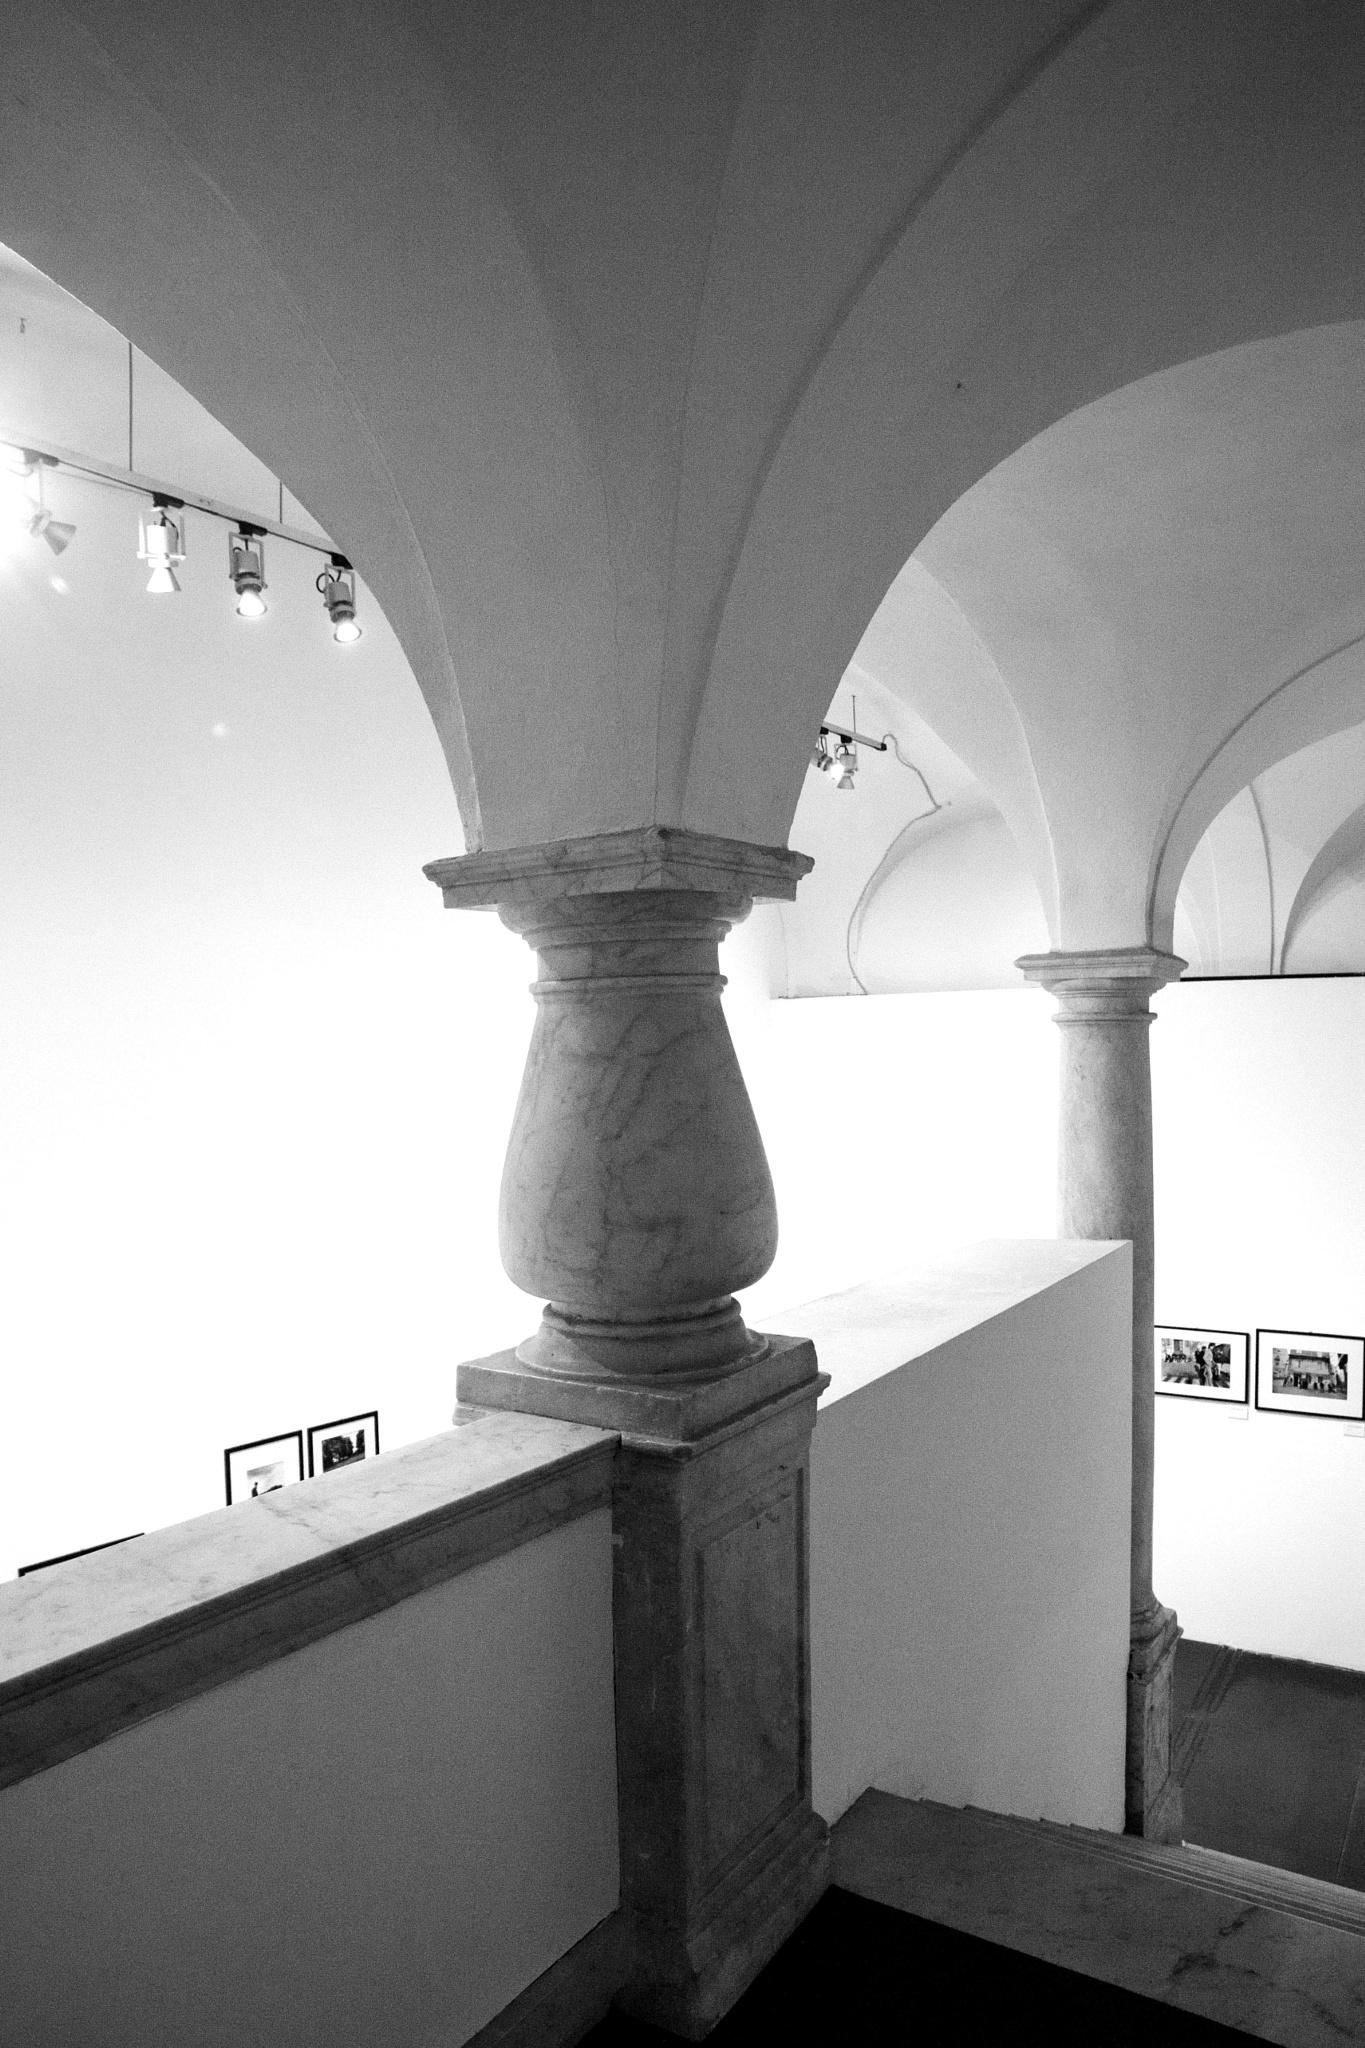 genova palazzo ducale by bcorech